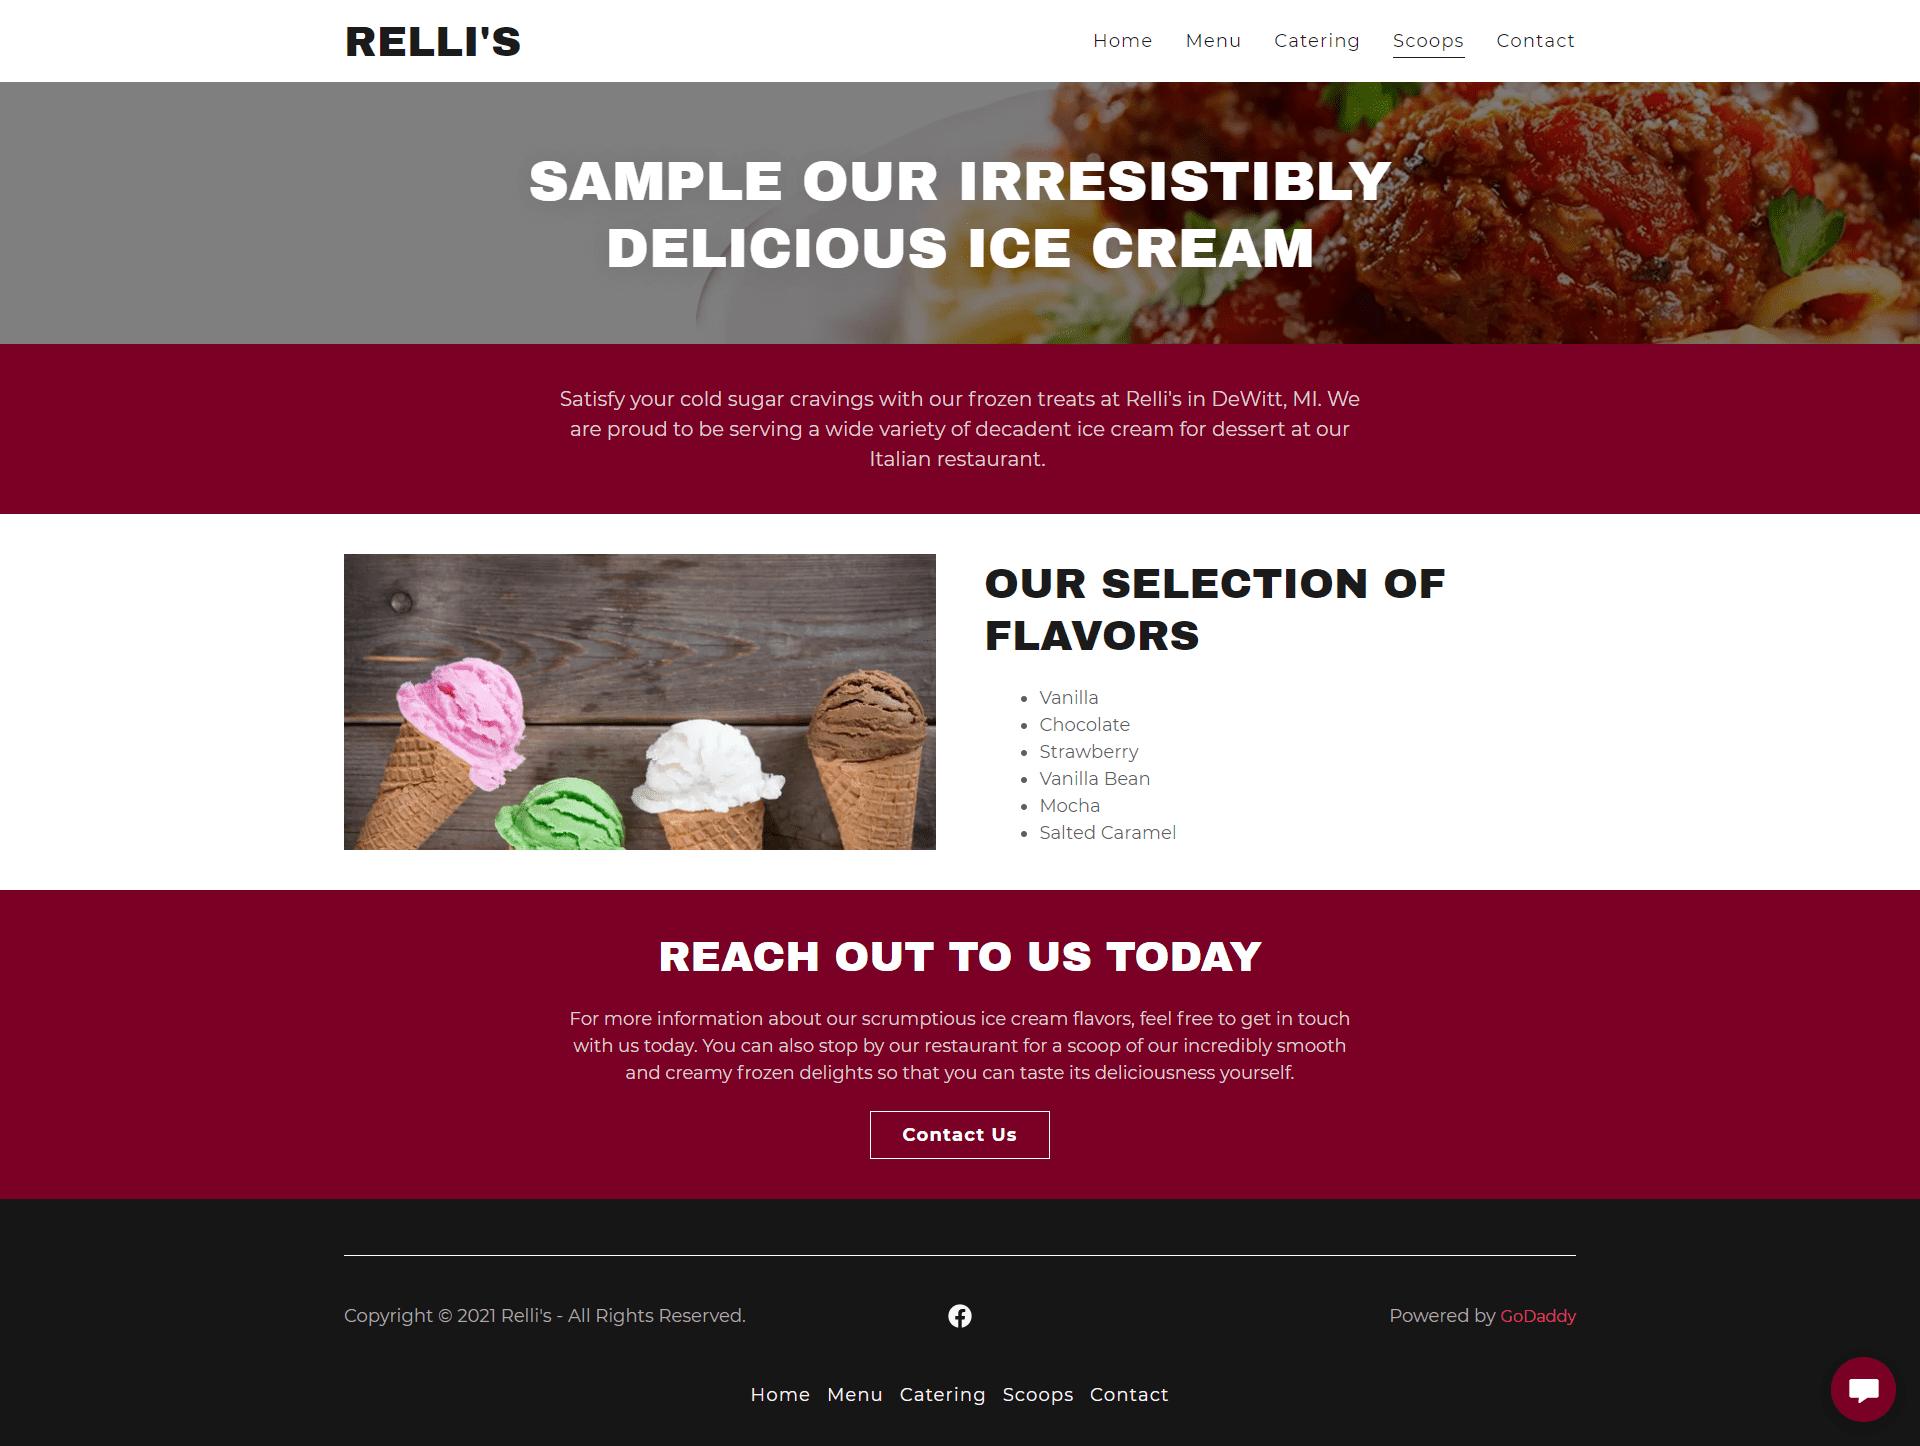 httpsrellis.godaddysites.com scoops